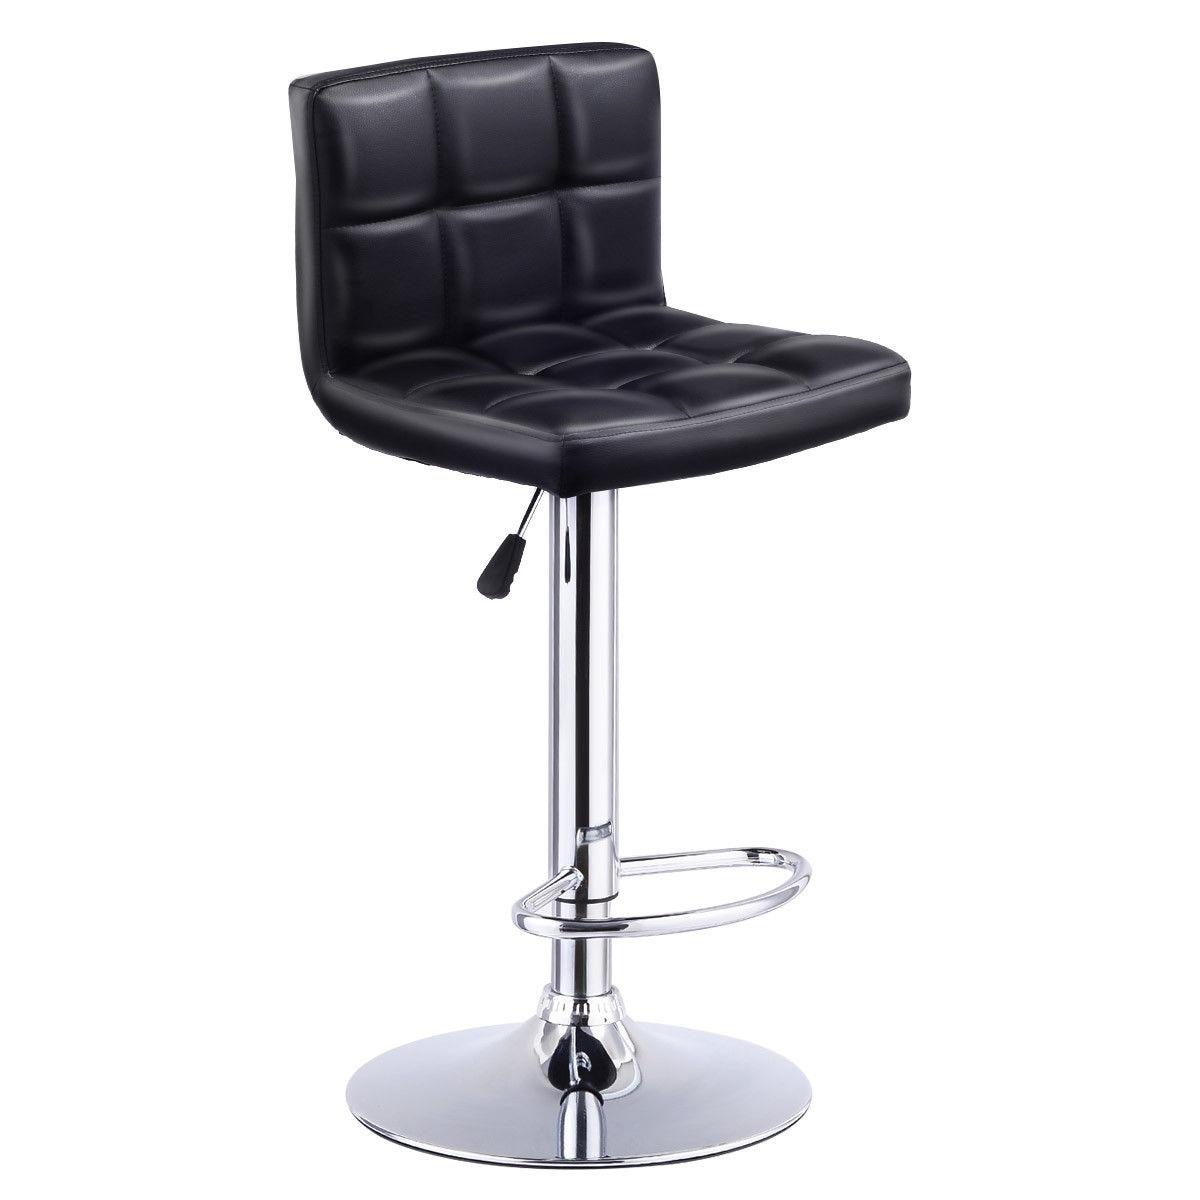 купить Giantex Bar Stool Swivel Adjustable PU Leather Barstools Bistro Pub Chair Modern Living Room Bar Furniture HW53843BK по цене 3399.2 рублей